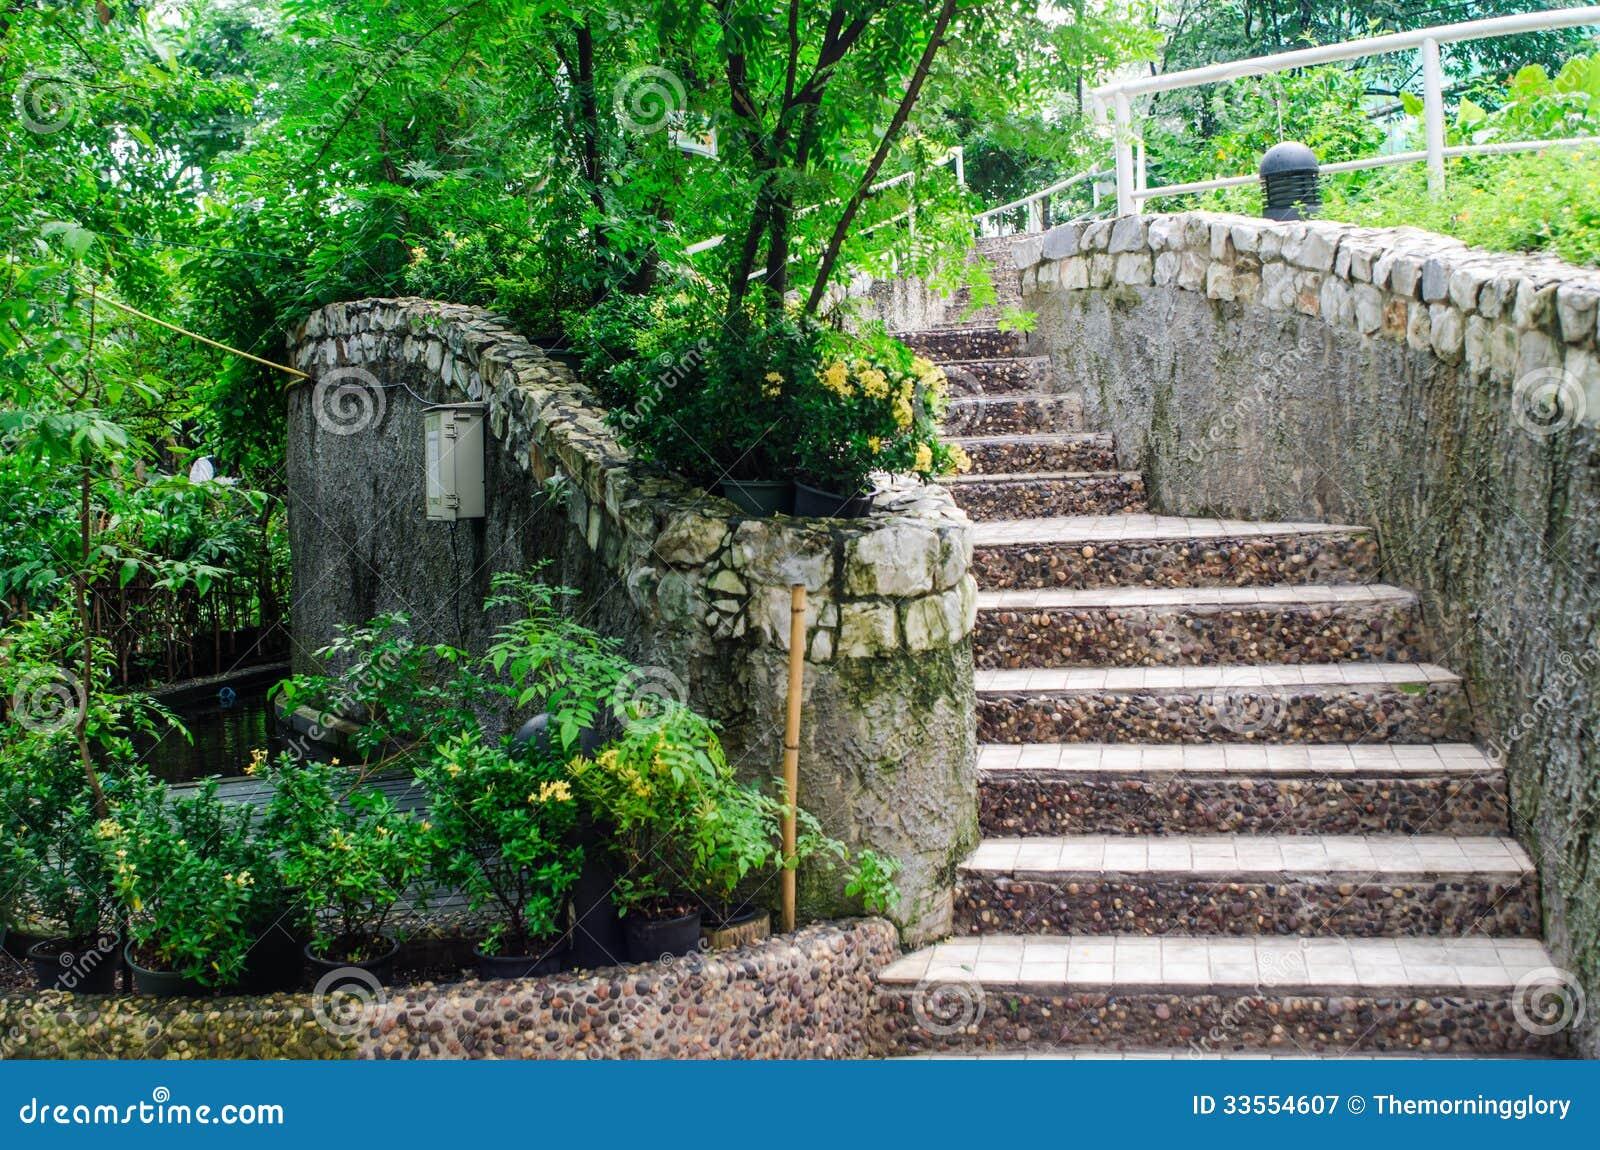 am nagement dans le jardin l 39 escalier dans le jardin. Black Bedroom Furniture Sets. Home Design Ideas